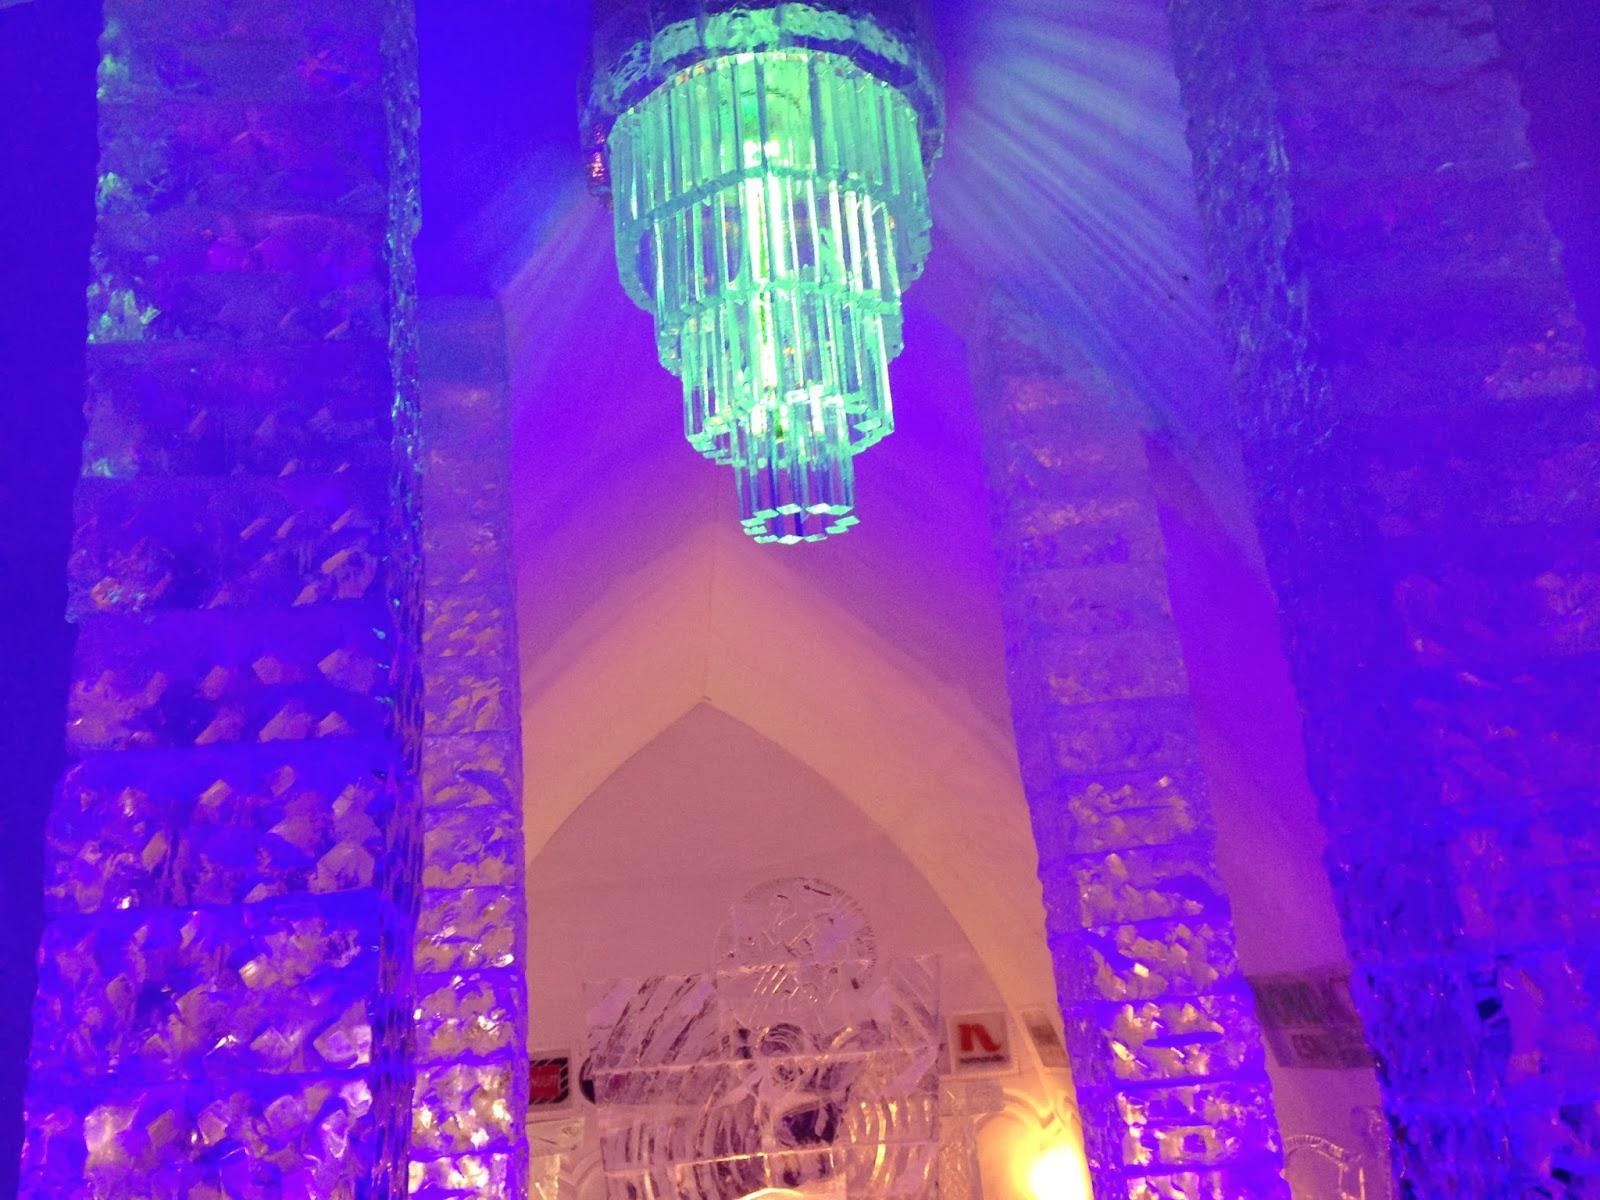 Hotel De Glace ice chandelier in the main lobby